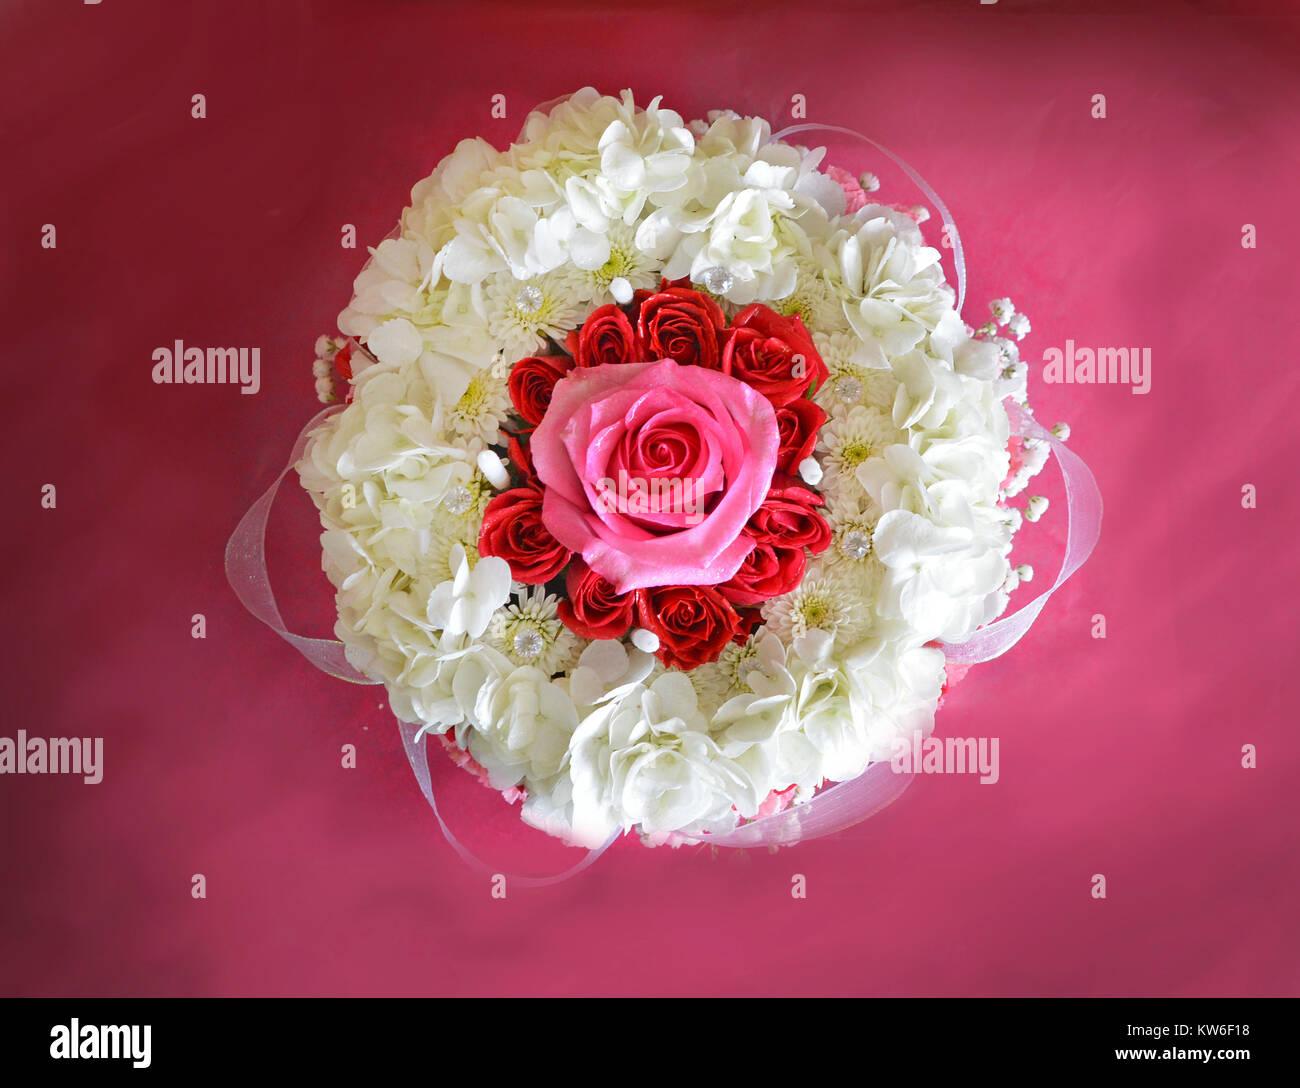 Wedding Centerpiece Stock Photos & Wedding Centerpiece Stock Images ...